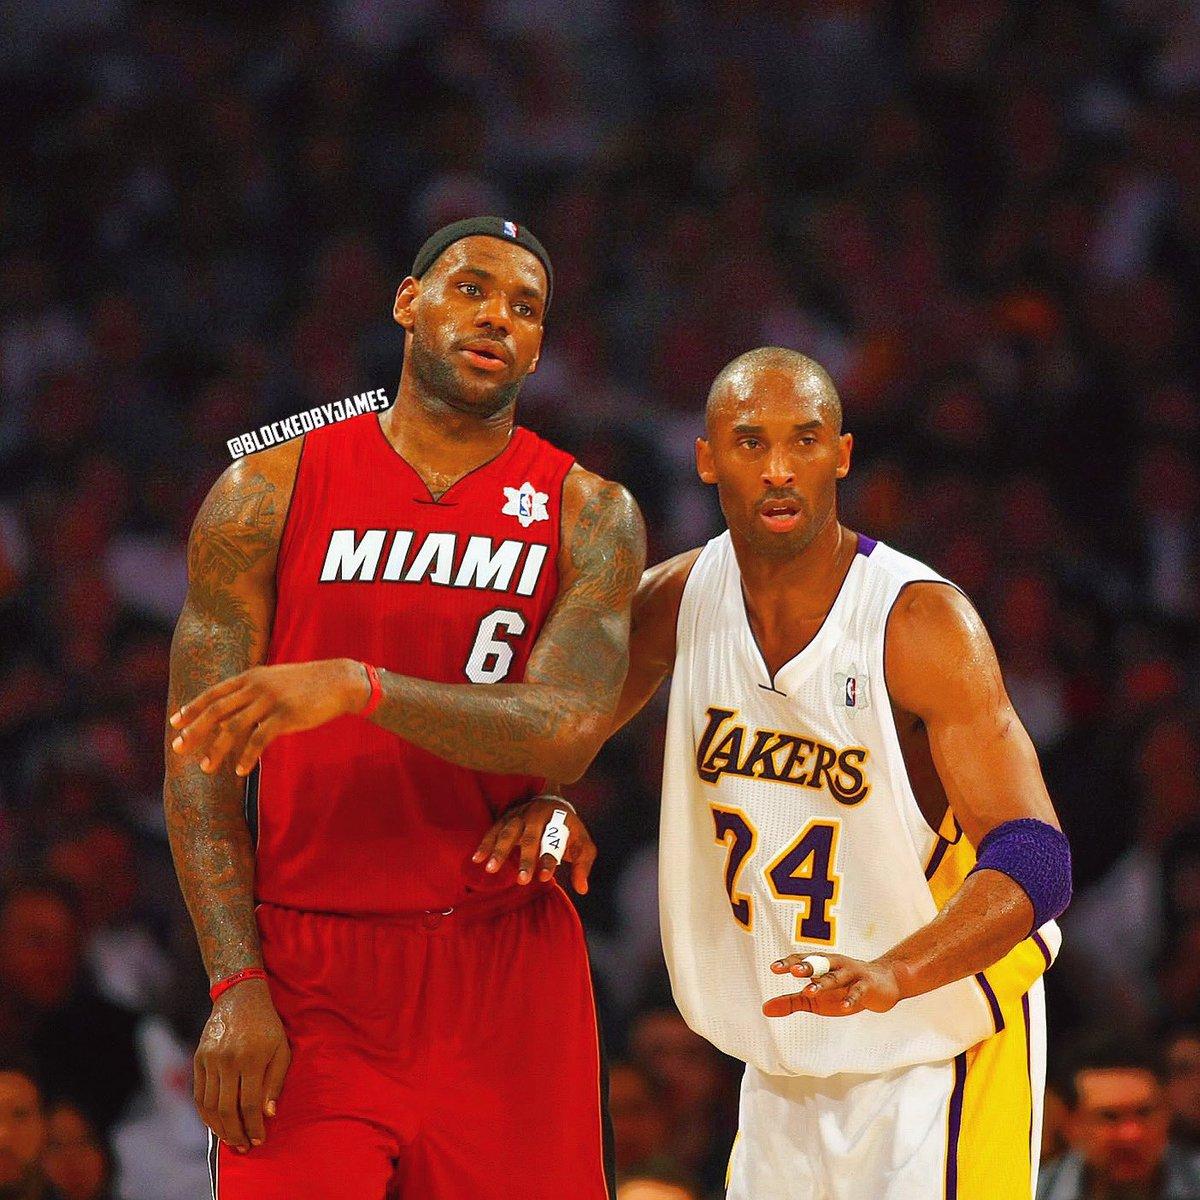 The Lakers-Heat Finals we SHOULD'VE got in 2011... 👑 x 🐍 @KingJames